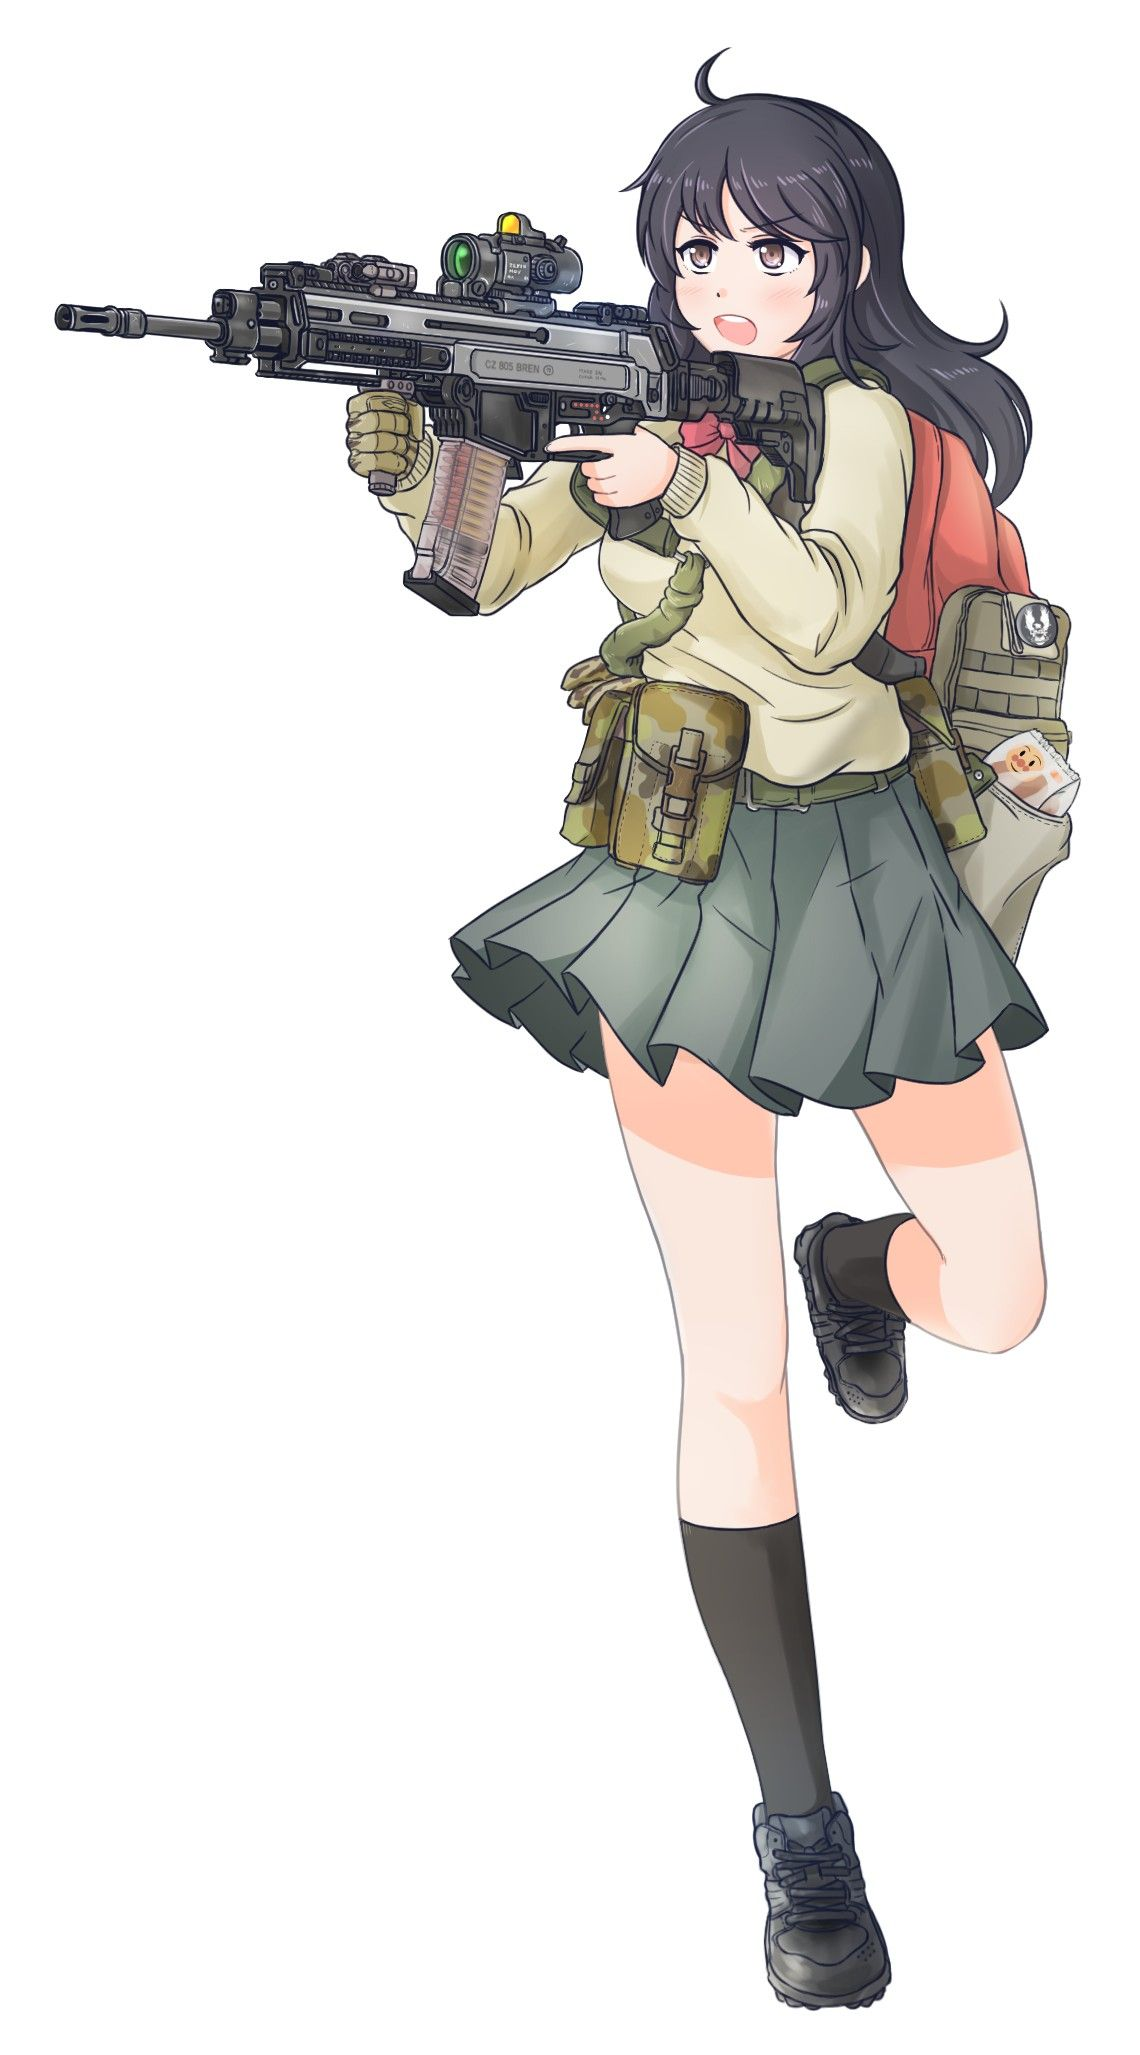 Pin on Anime Fantasies